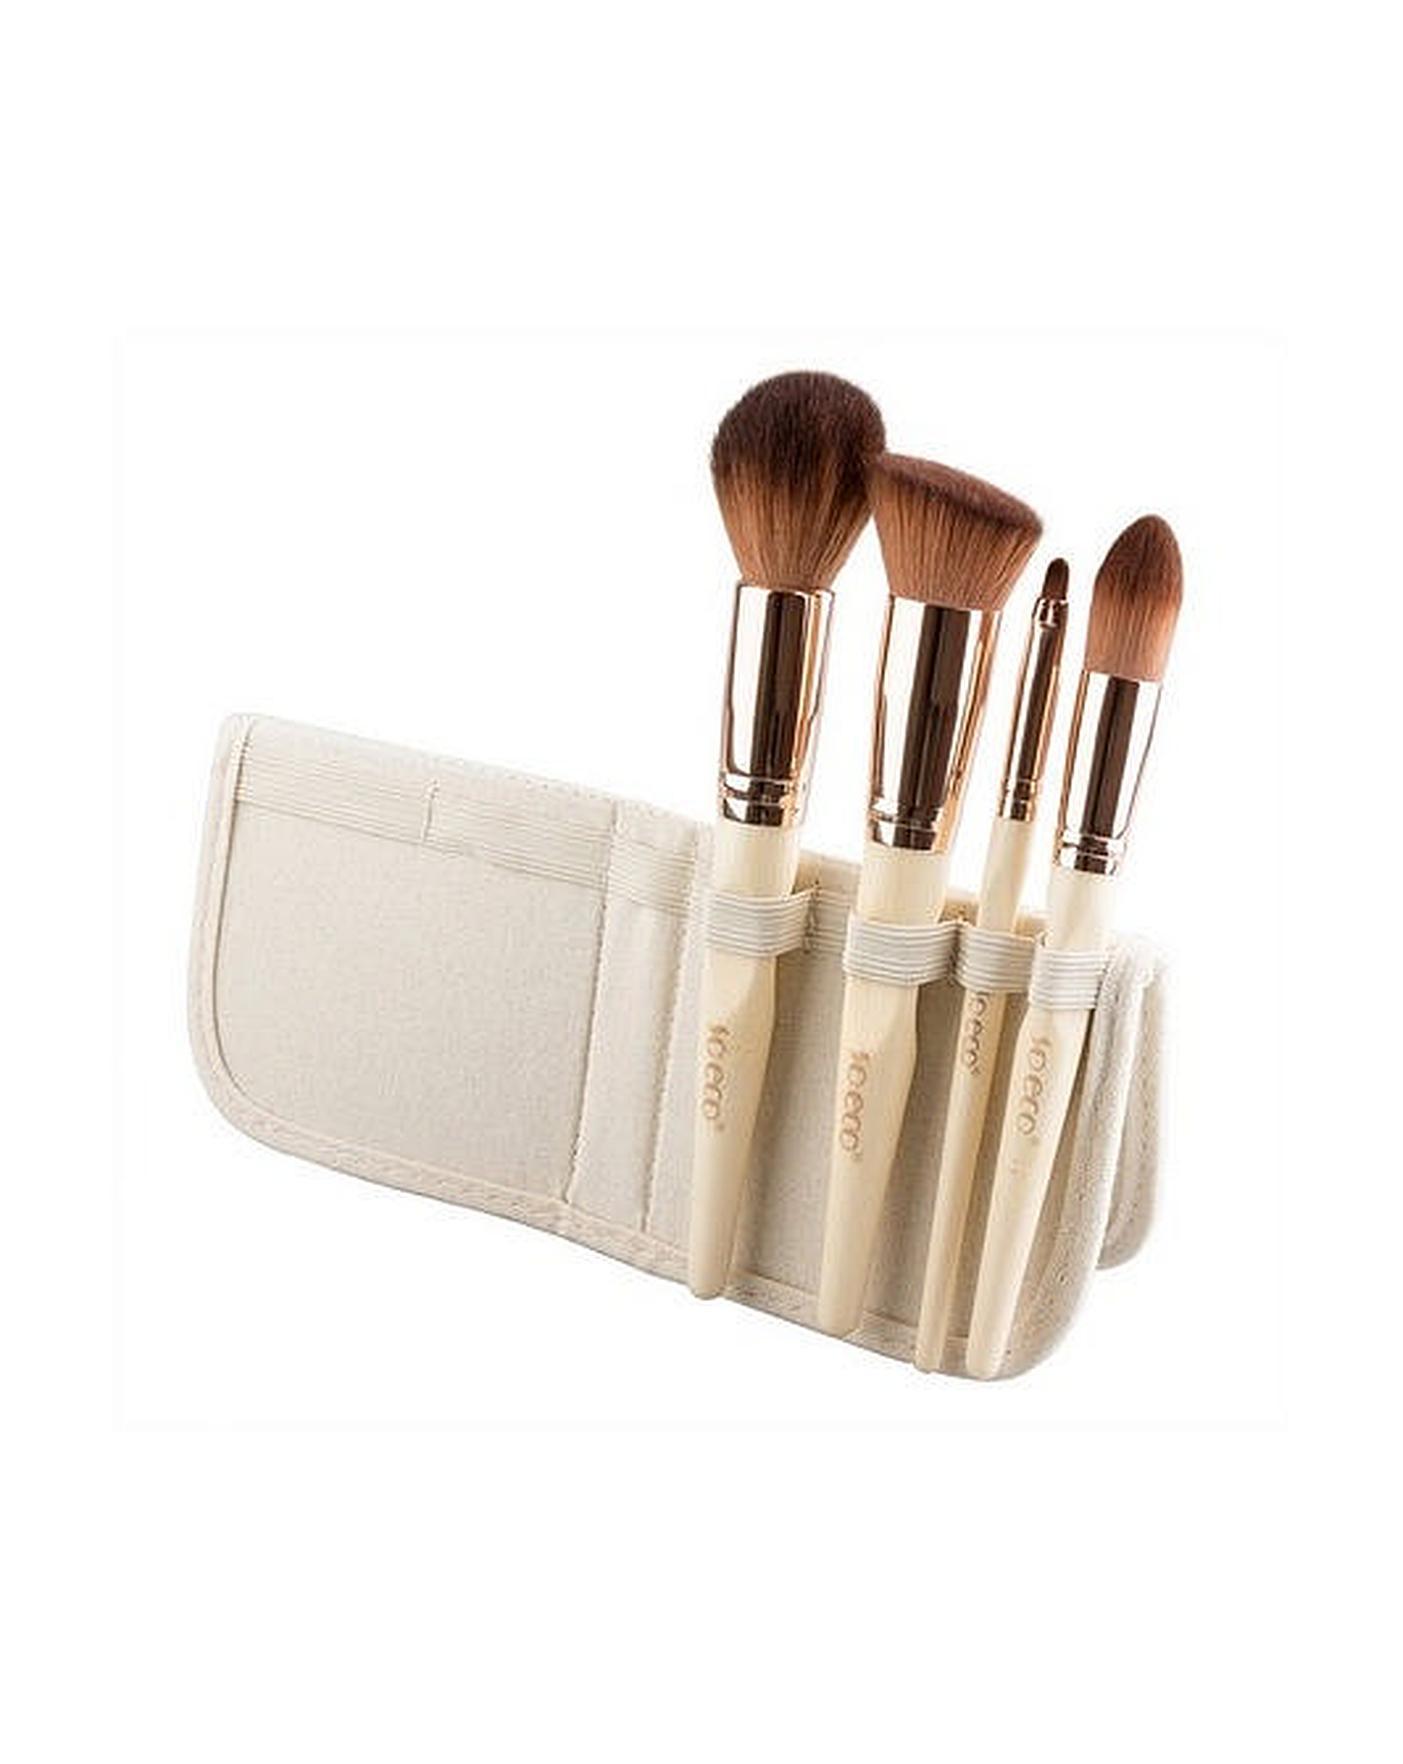 So Eco Face Makeup Brush Set Simply Be